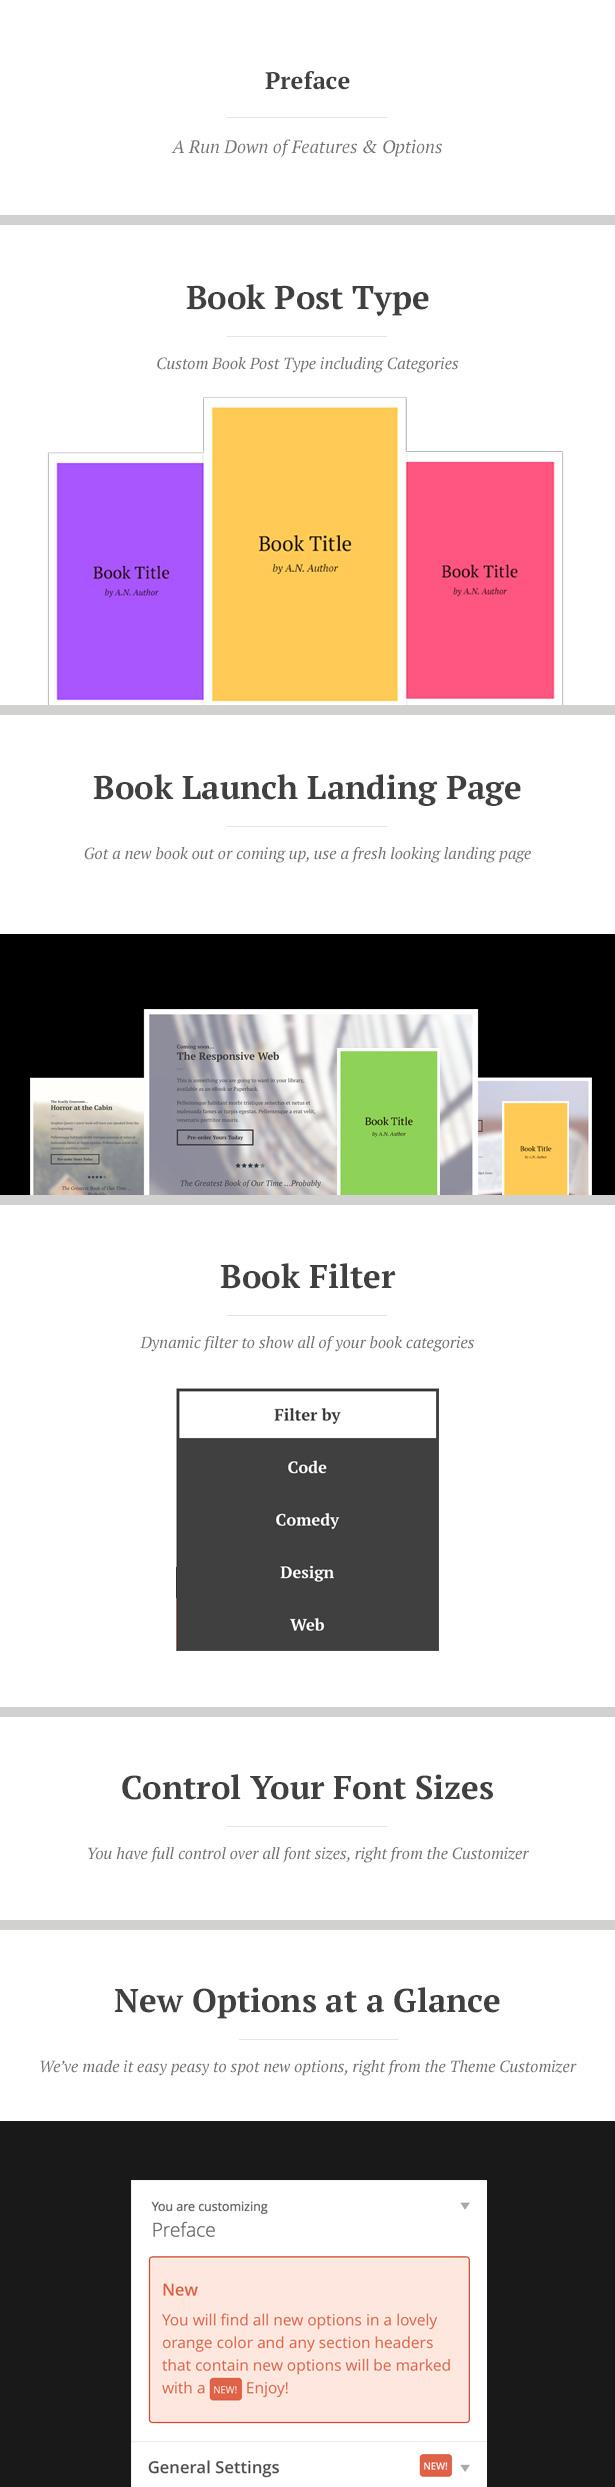 WordPress theme Preface: A WordPress Theme for Authors (Marketing)